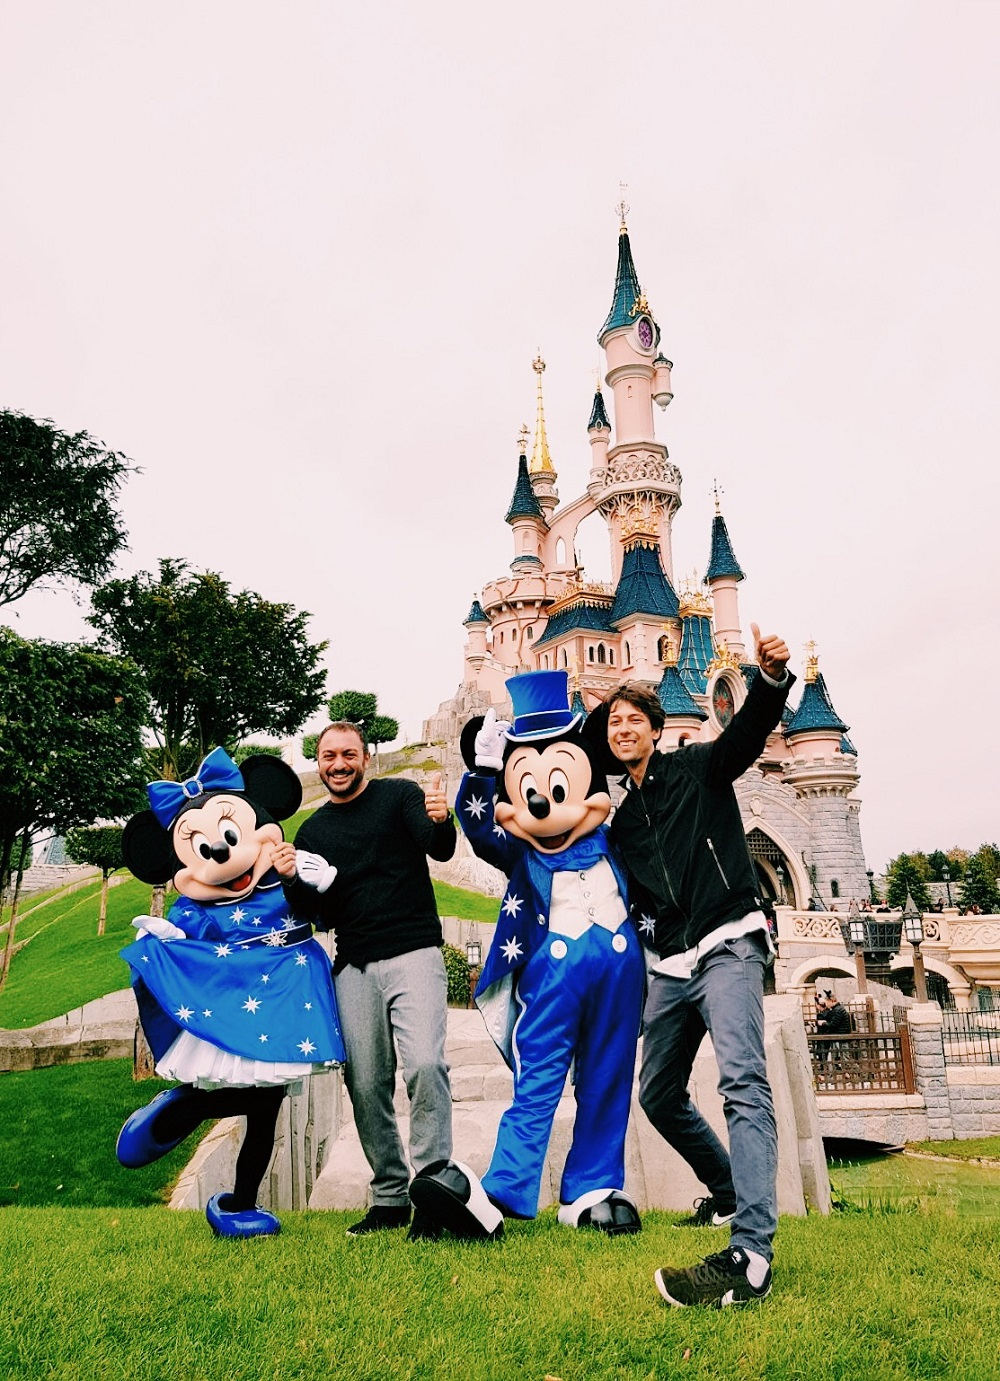 Offerte per un Weekend a Disneyland Paris: il nostro viaggio